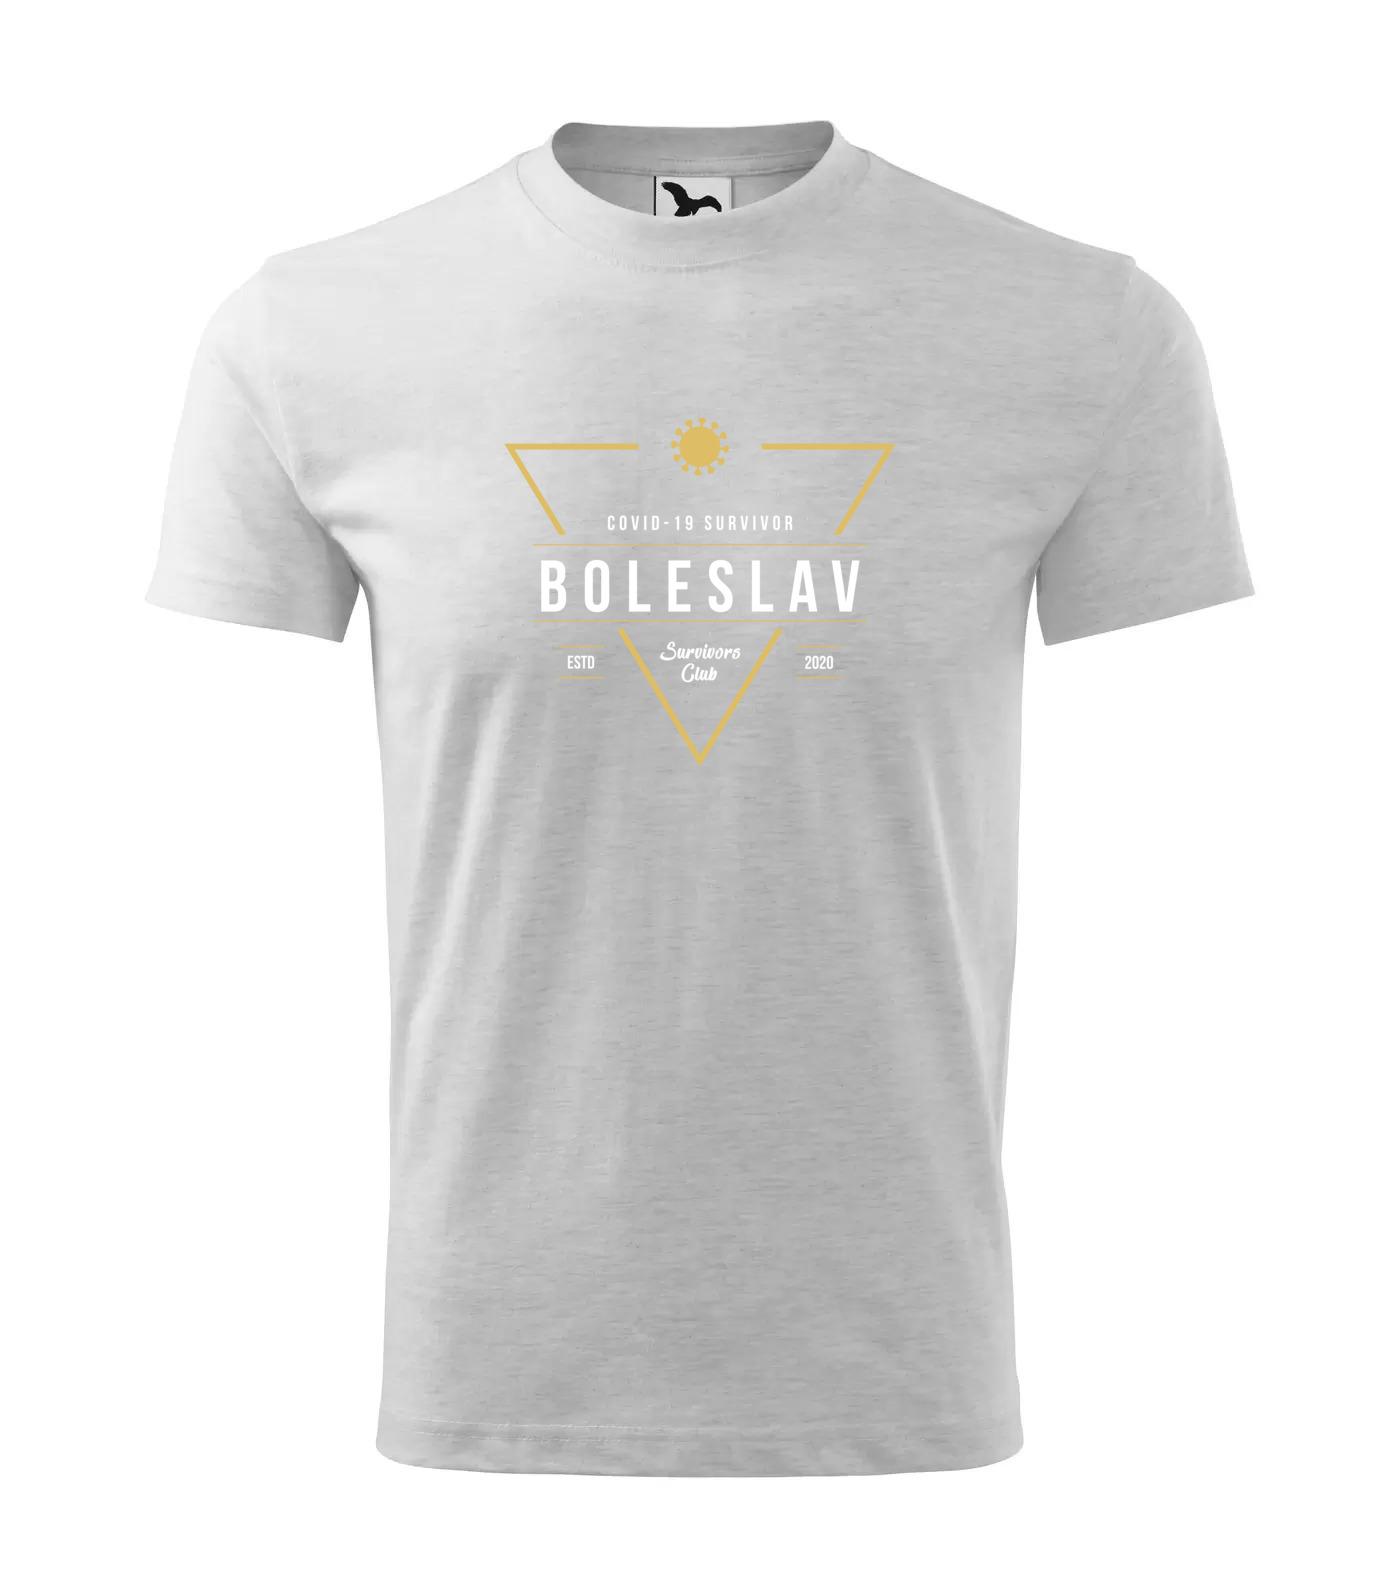 Tričko Survivor Club Boleslav